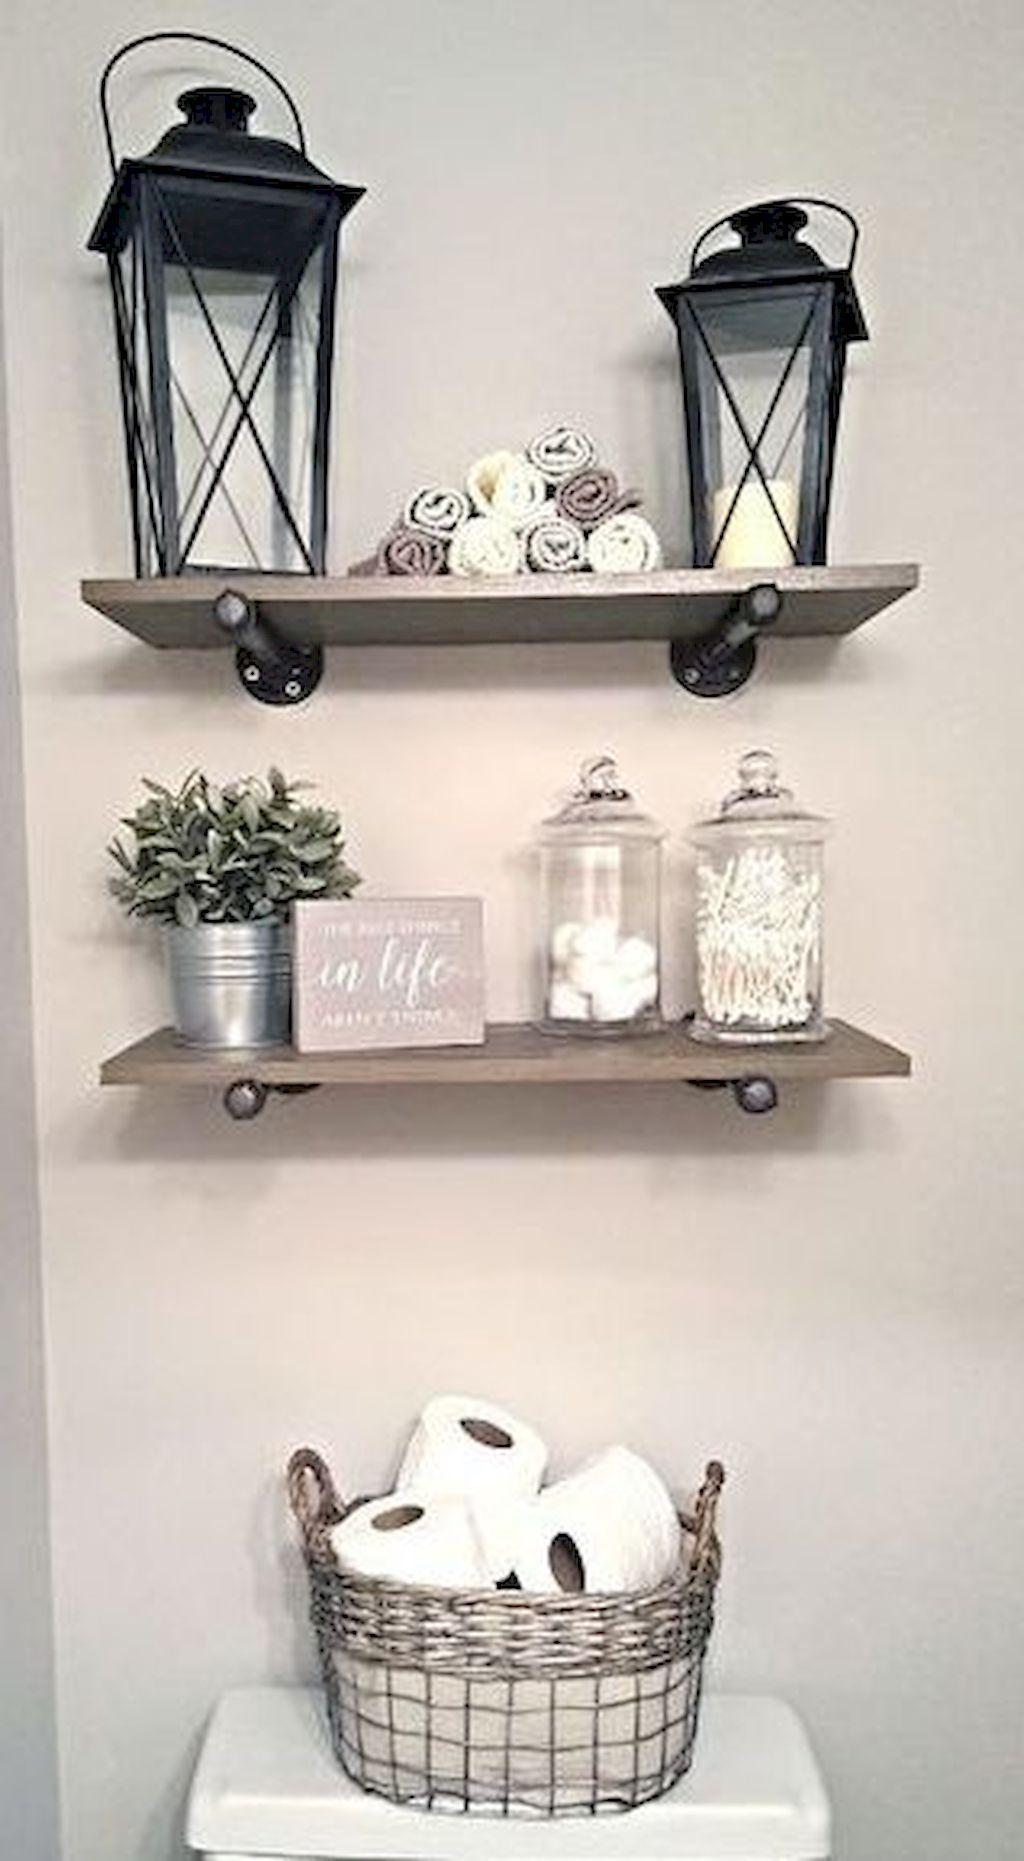 55 DIY Rustic Home Decor Ideas on A Budget   Erste wohnung ...